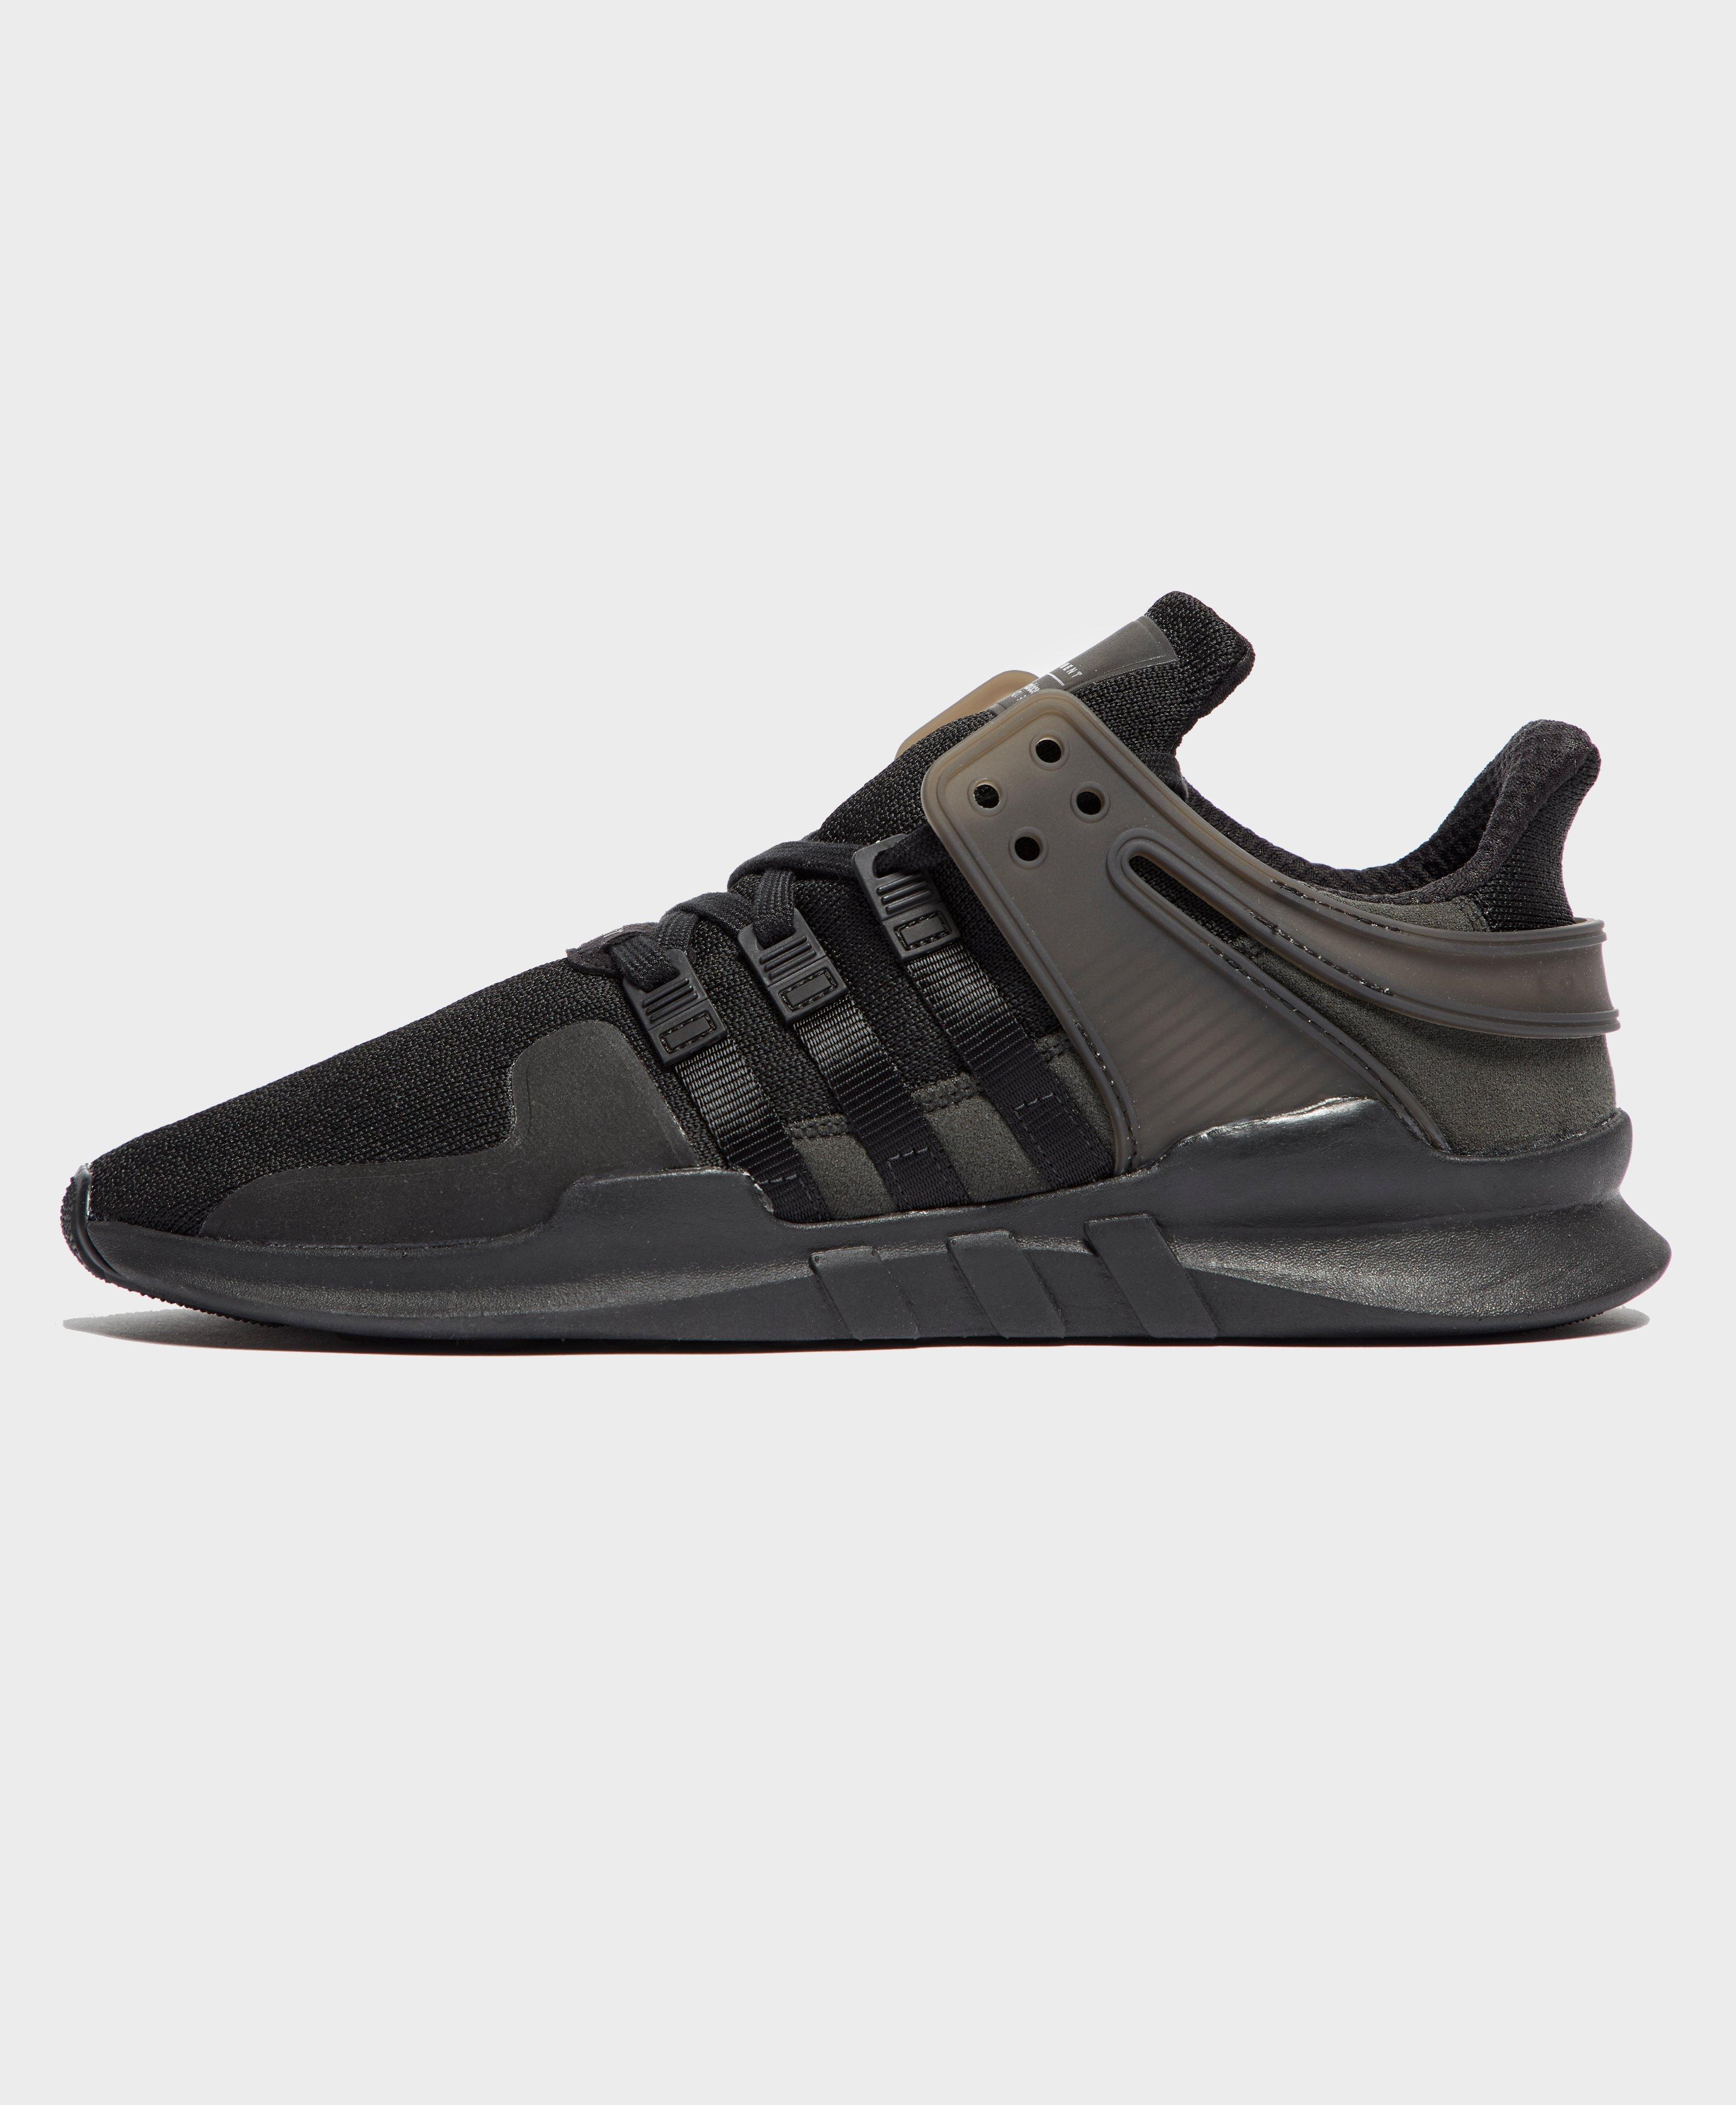 b251c2c662 adidas uk size chart men discount adidas gazelle shoes black ...